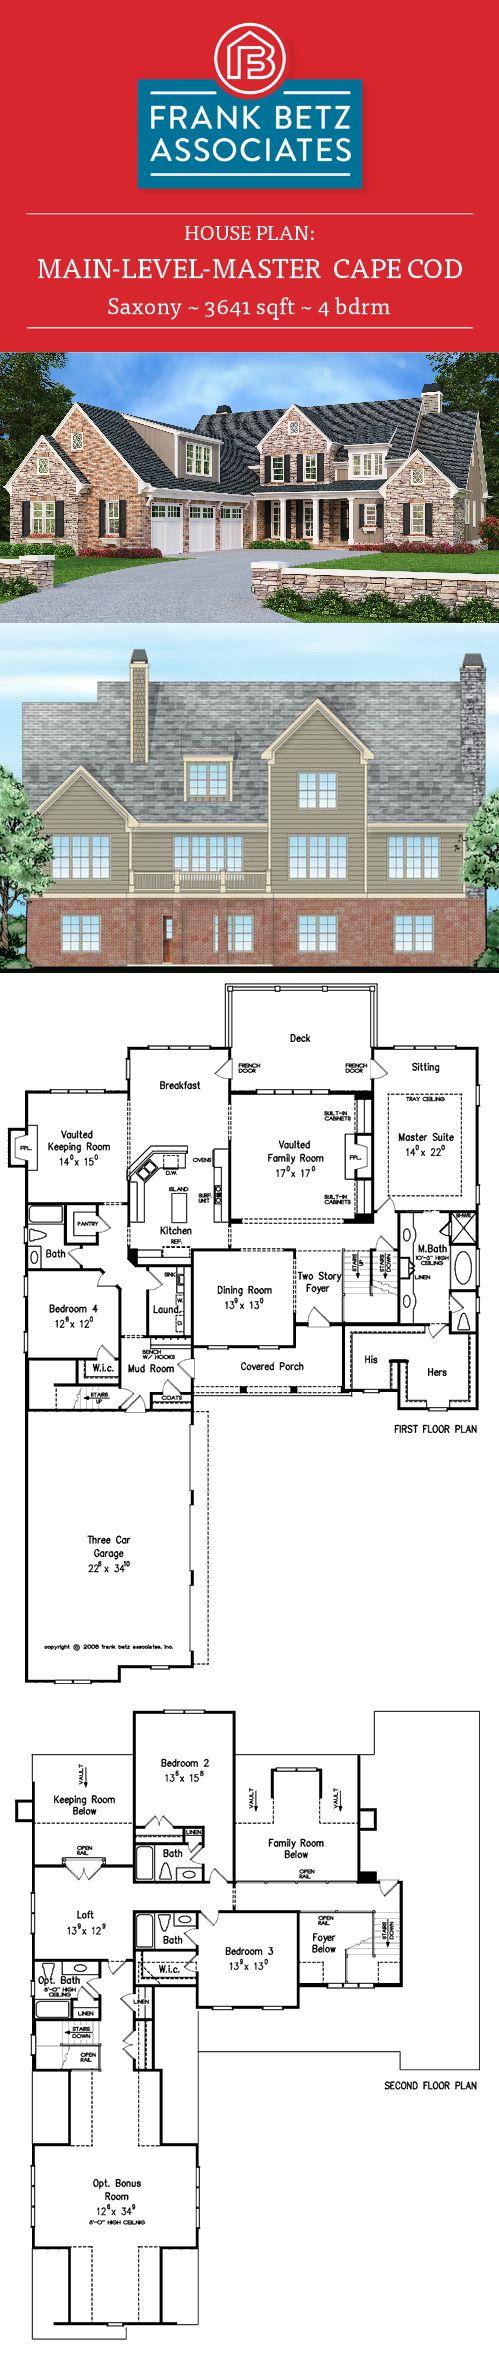 221 best main level master house plans images on pinterest house saxony 3641 sqft 4 bdrm cape cod house plan design by frank betz